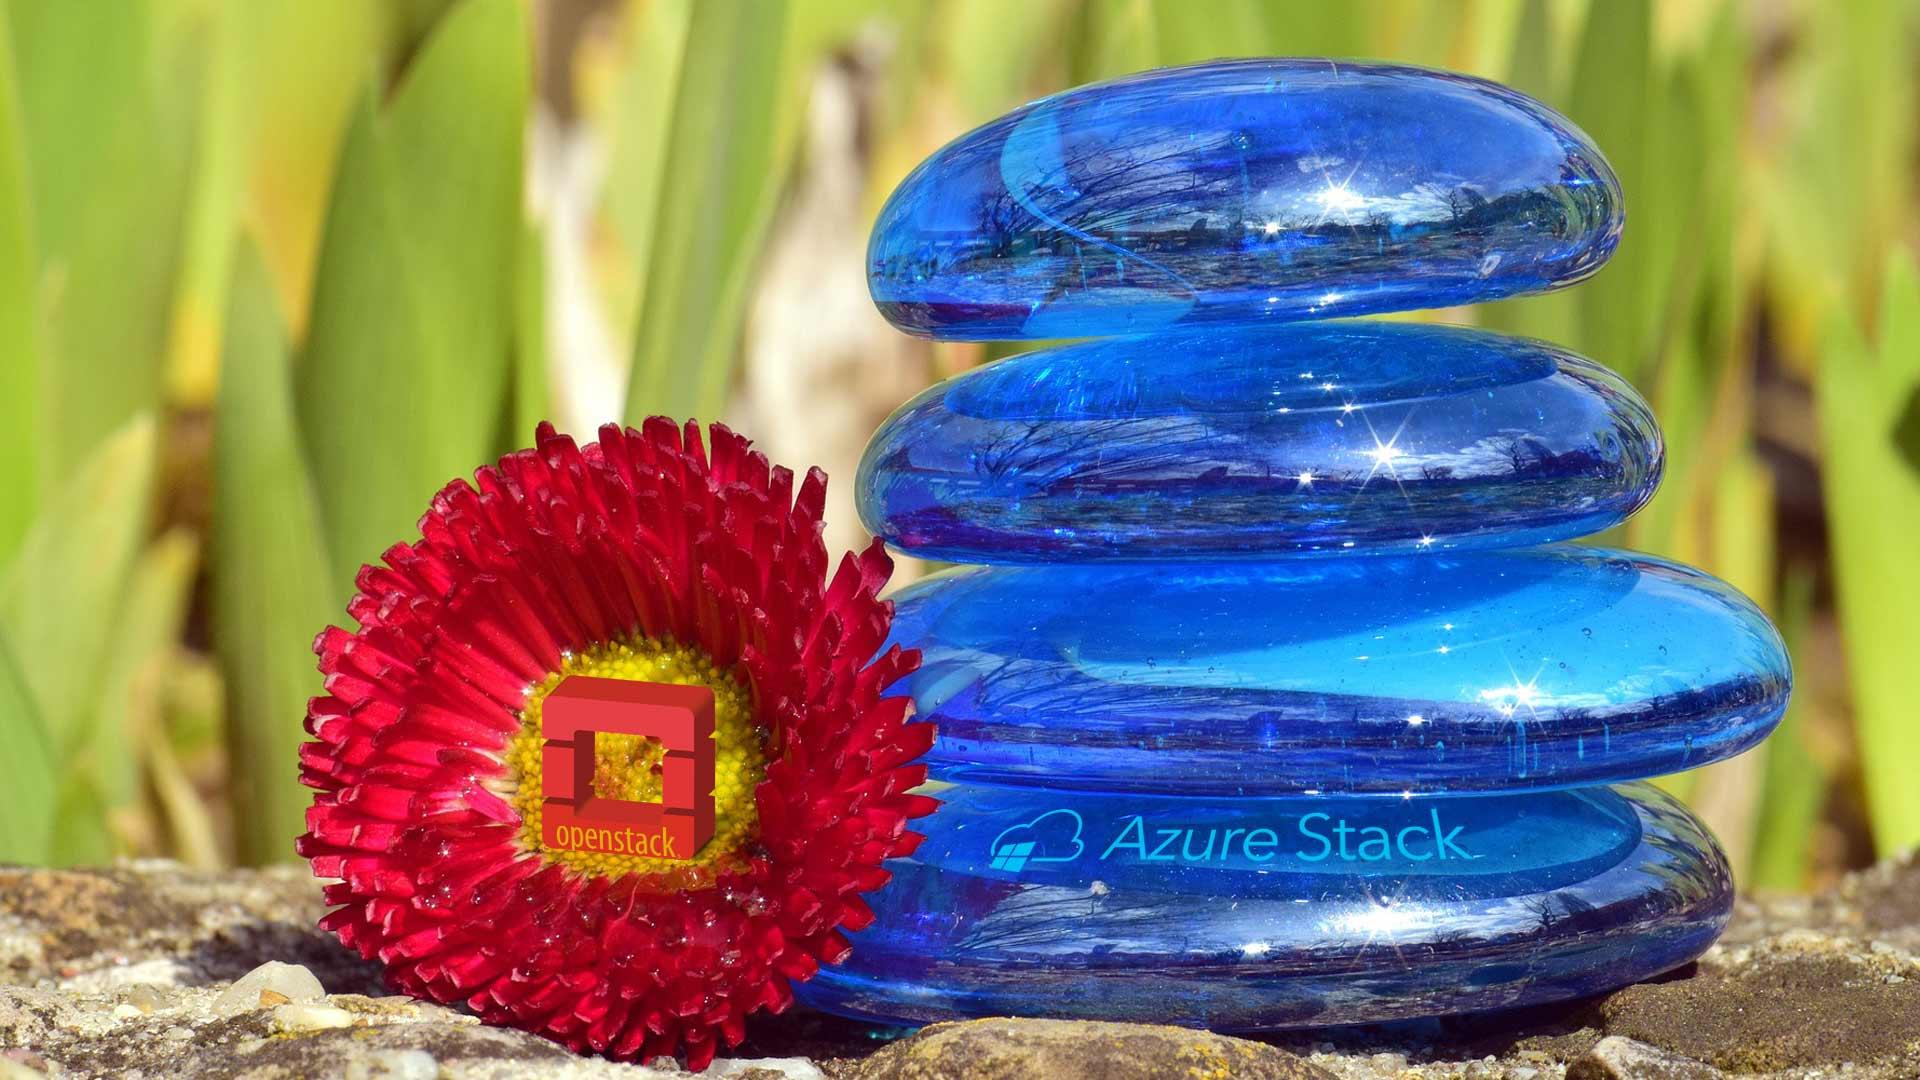 Red Hat OpenStack vs Microsoft Azure Stack